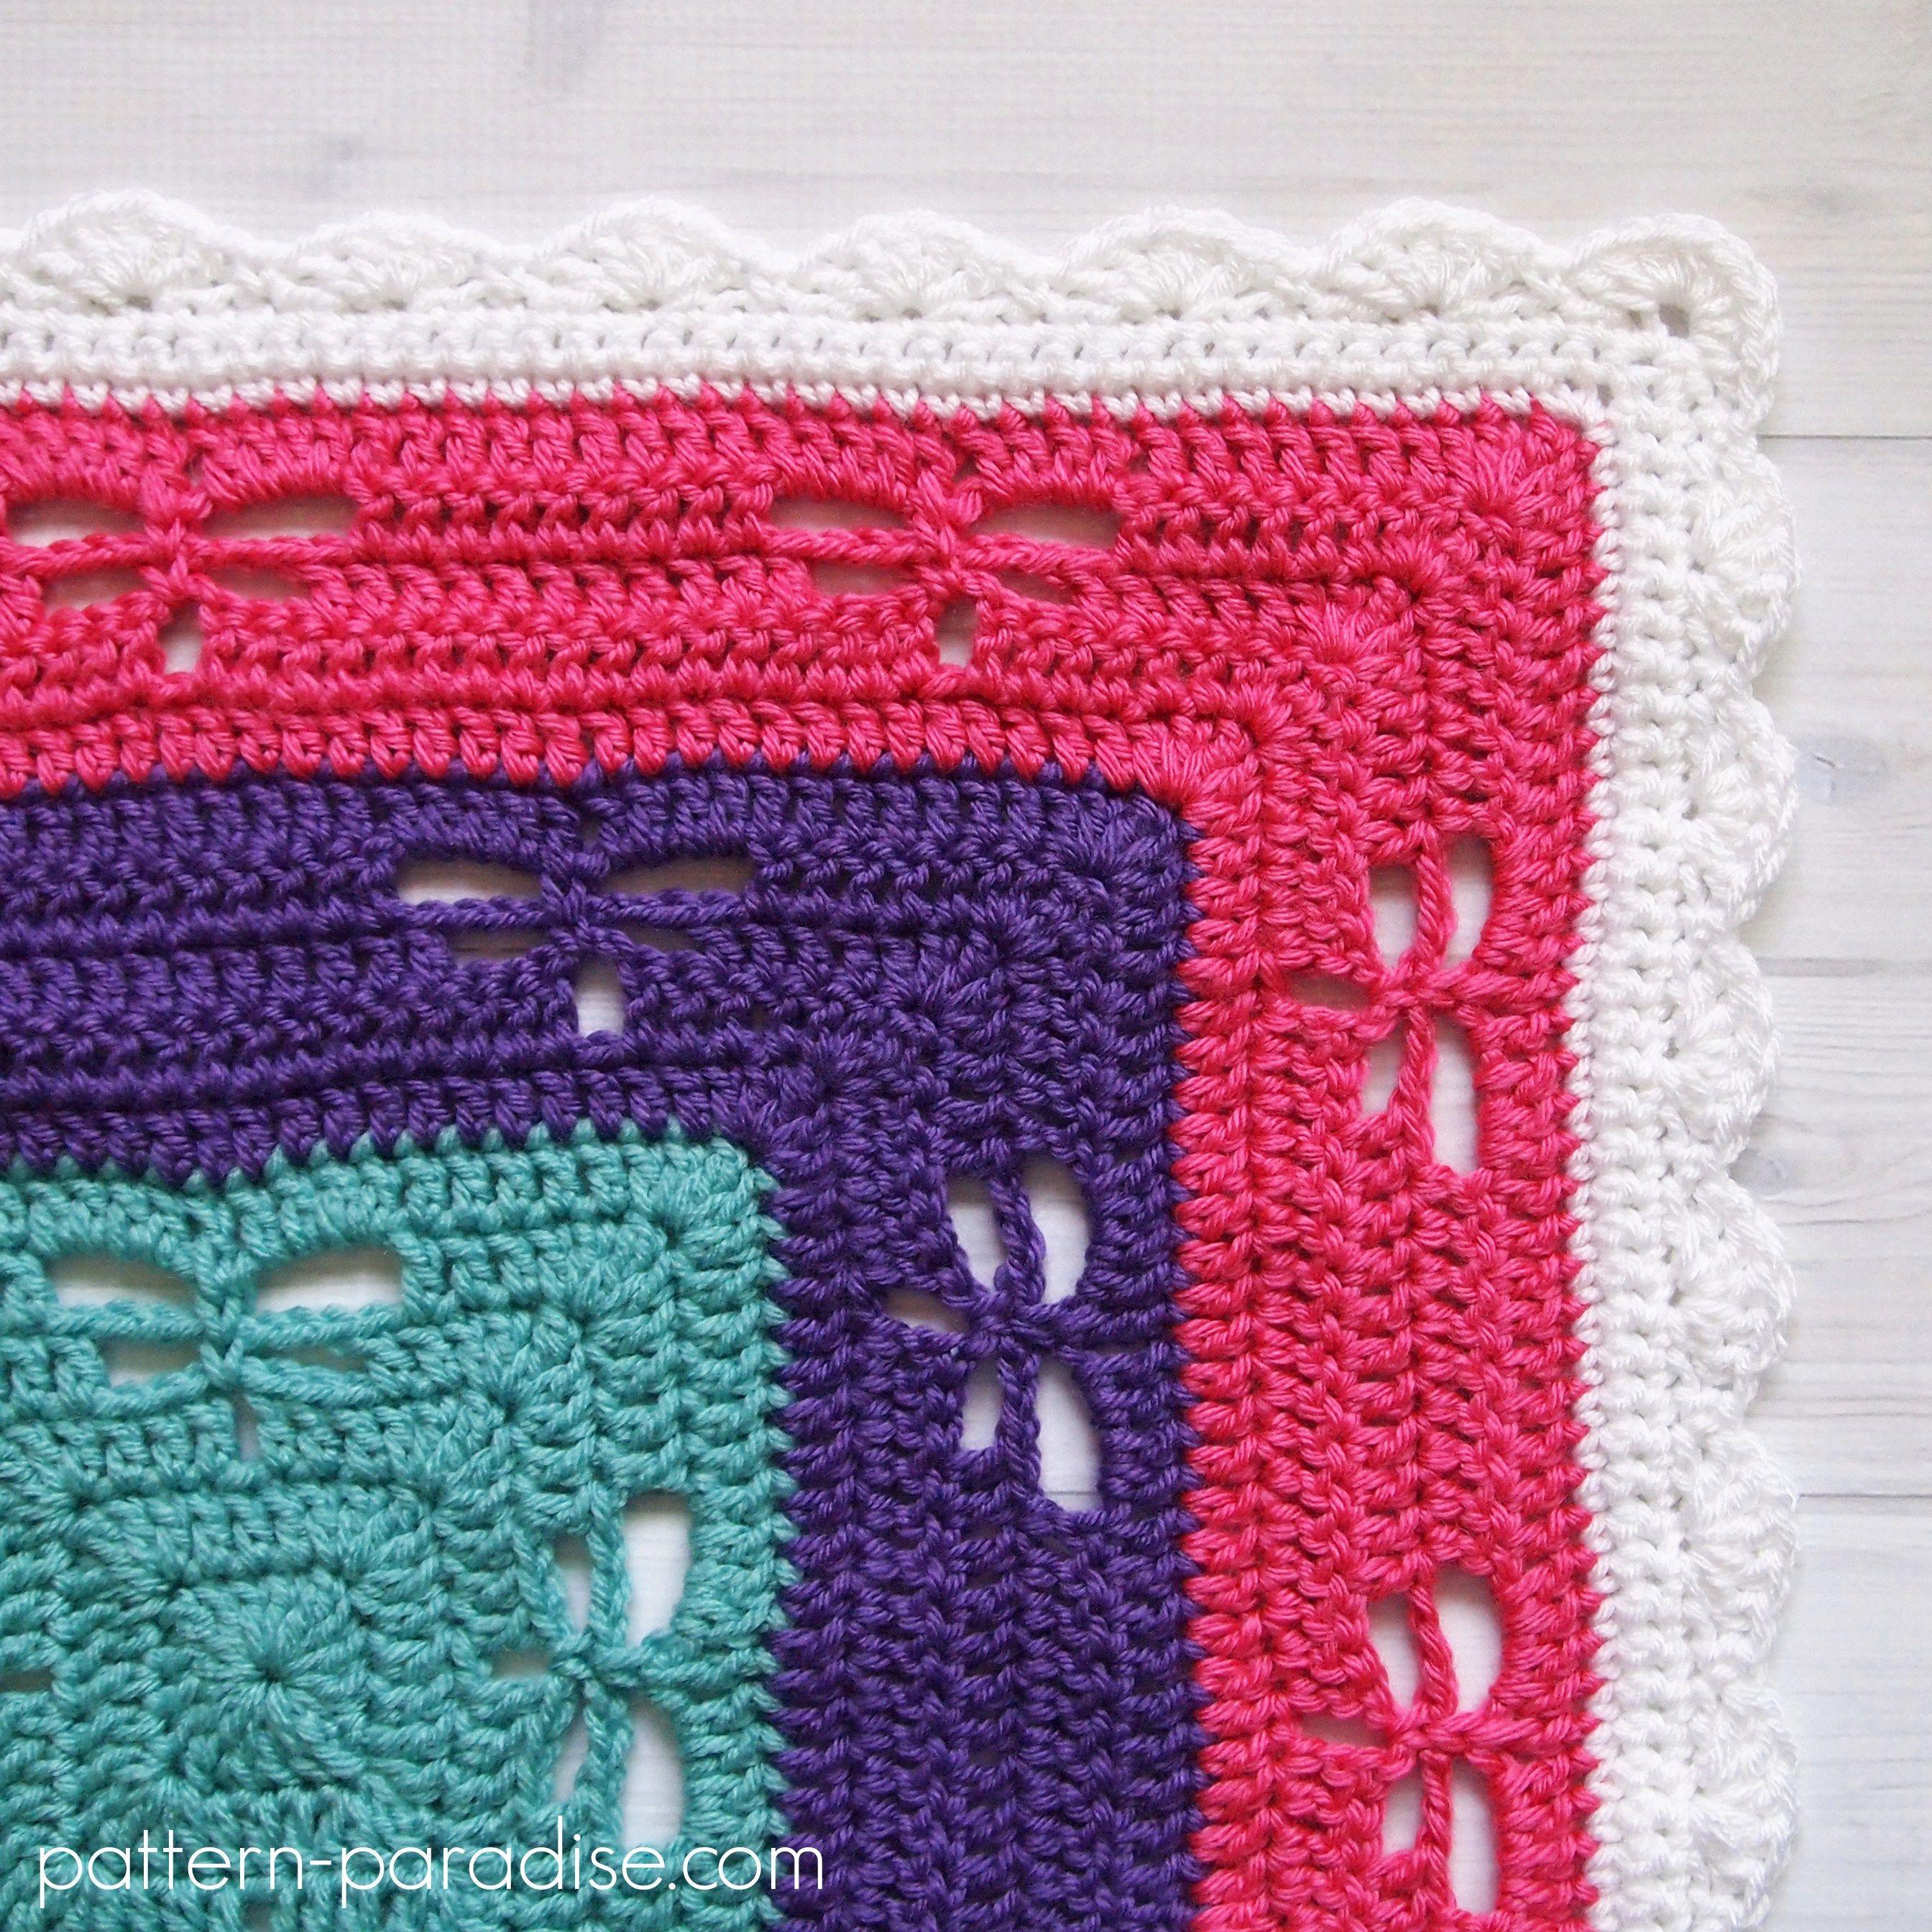 Free crochet pattern for radiating dragonflies afhgan, blanket or ...